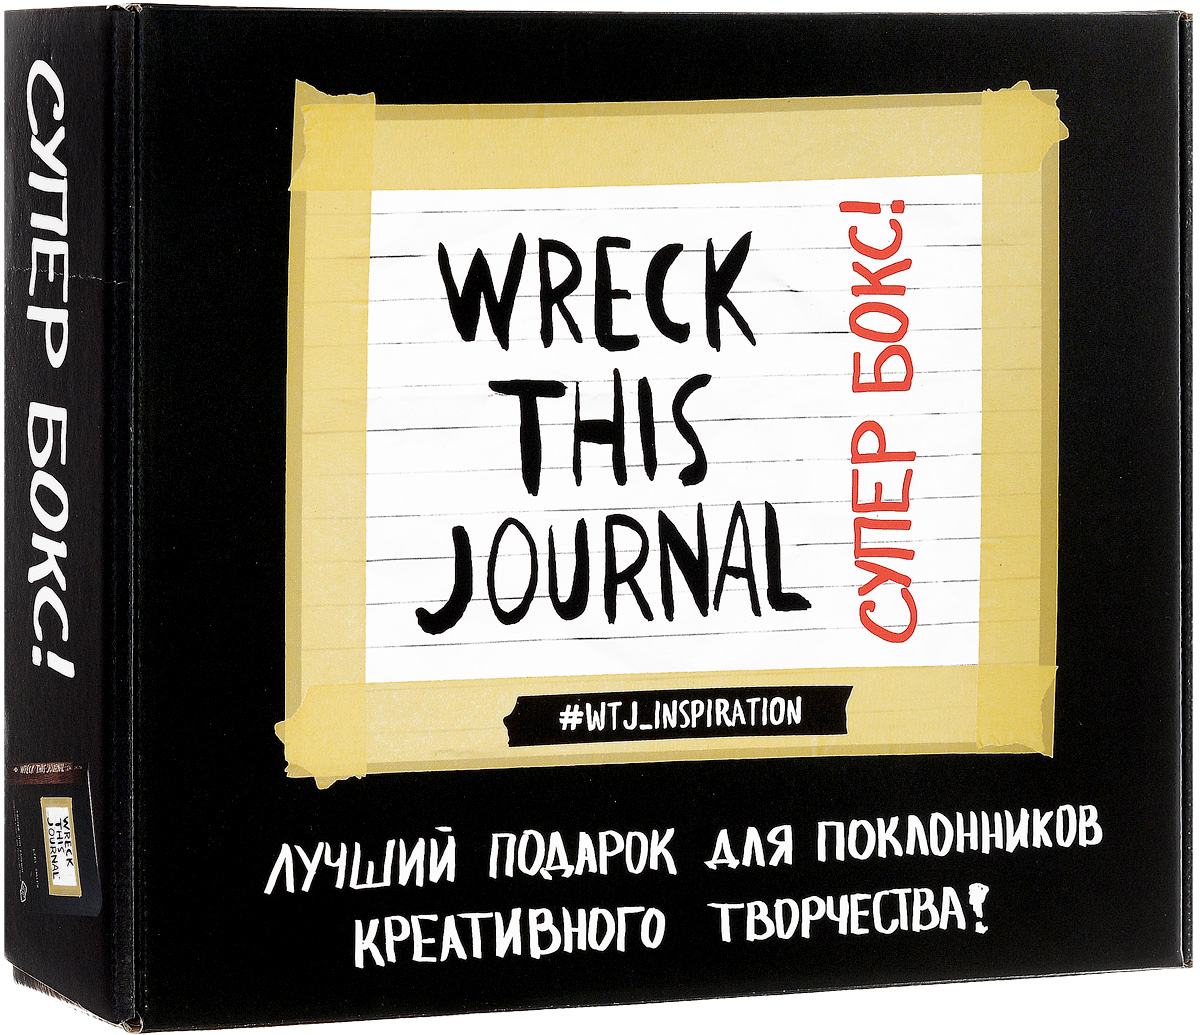 Кери Смит Wreck This Journal. Супербокс! Подарочная коробка комплект супербокс wreck this journal подарочная коробка